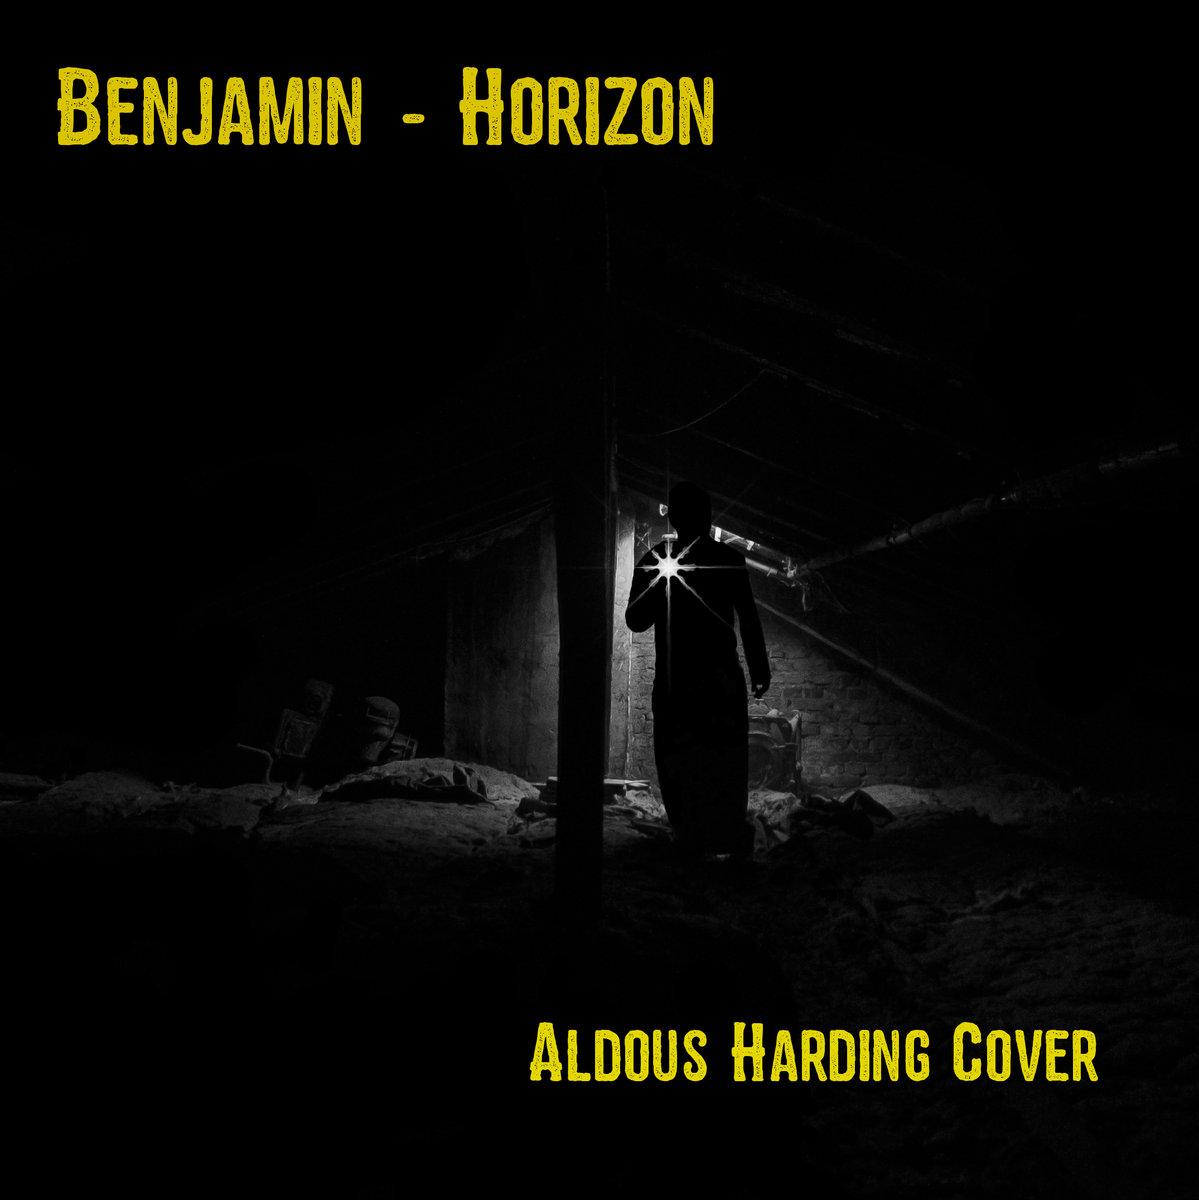 Horizon (Aldous Harding Cover)